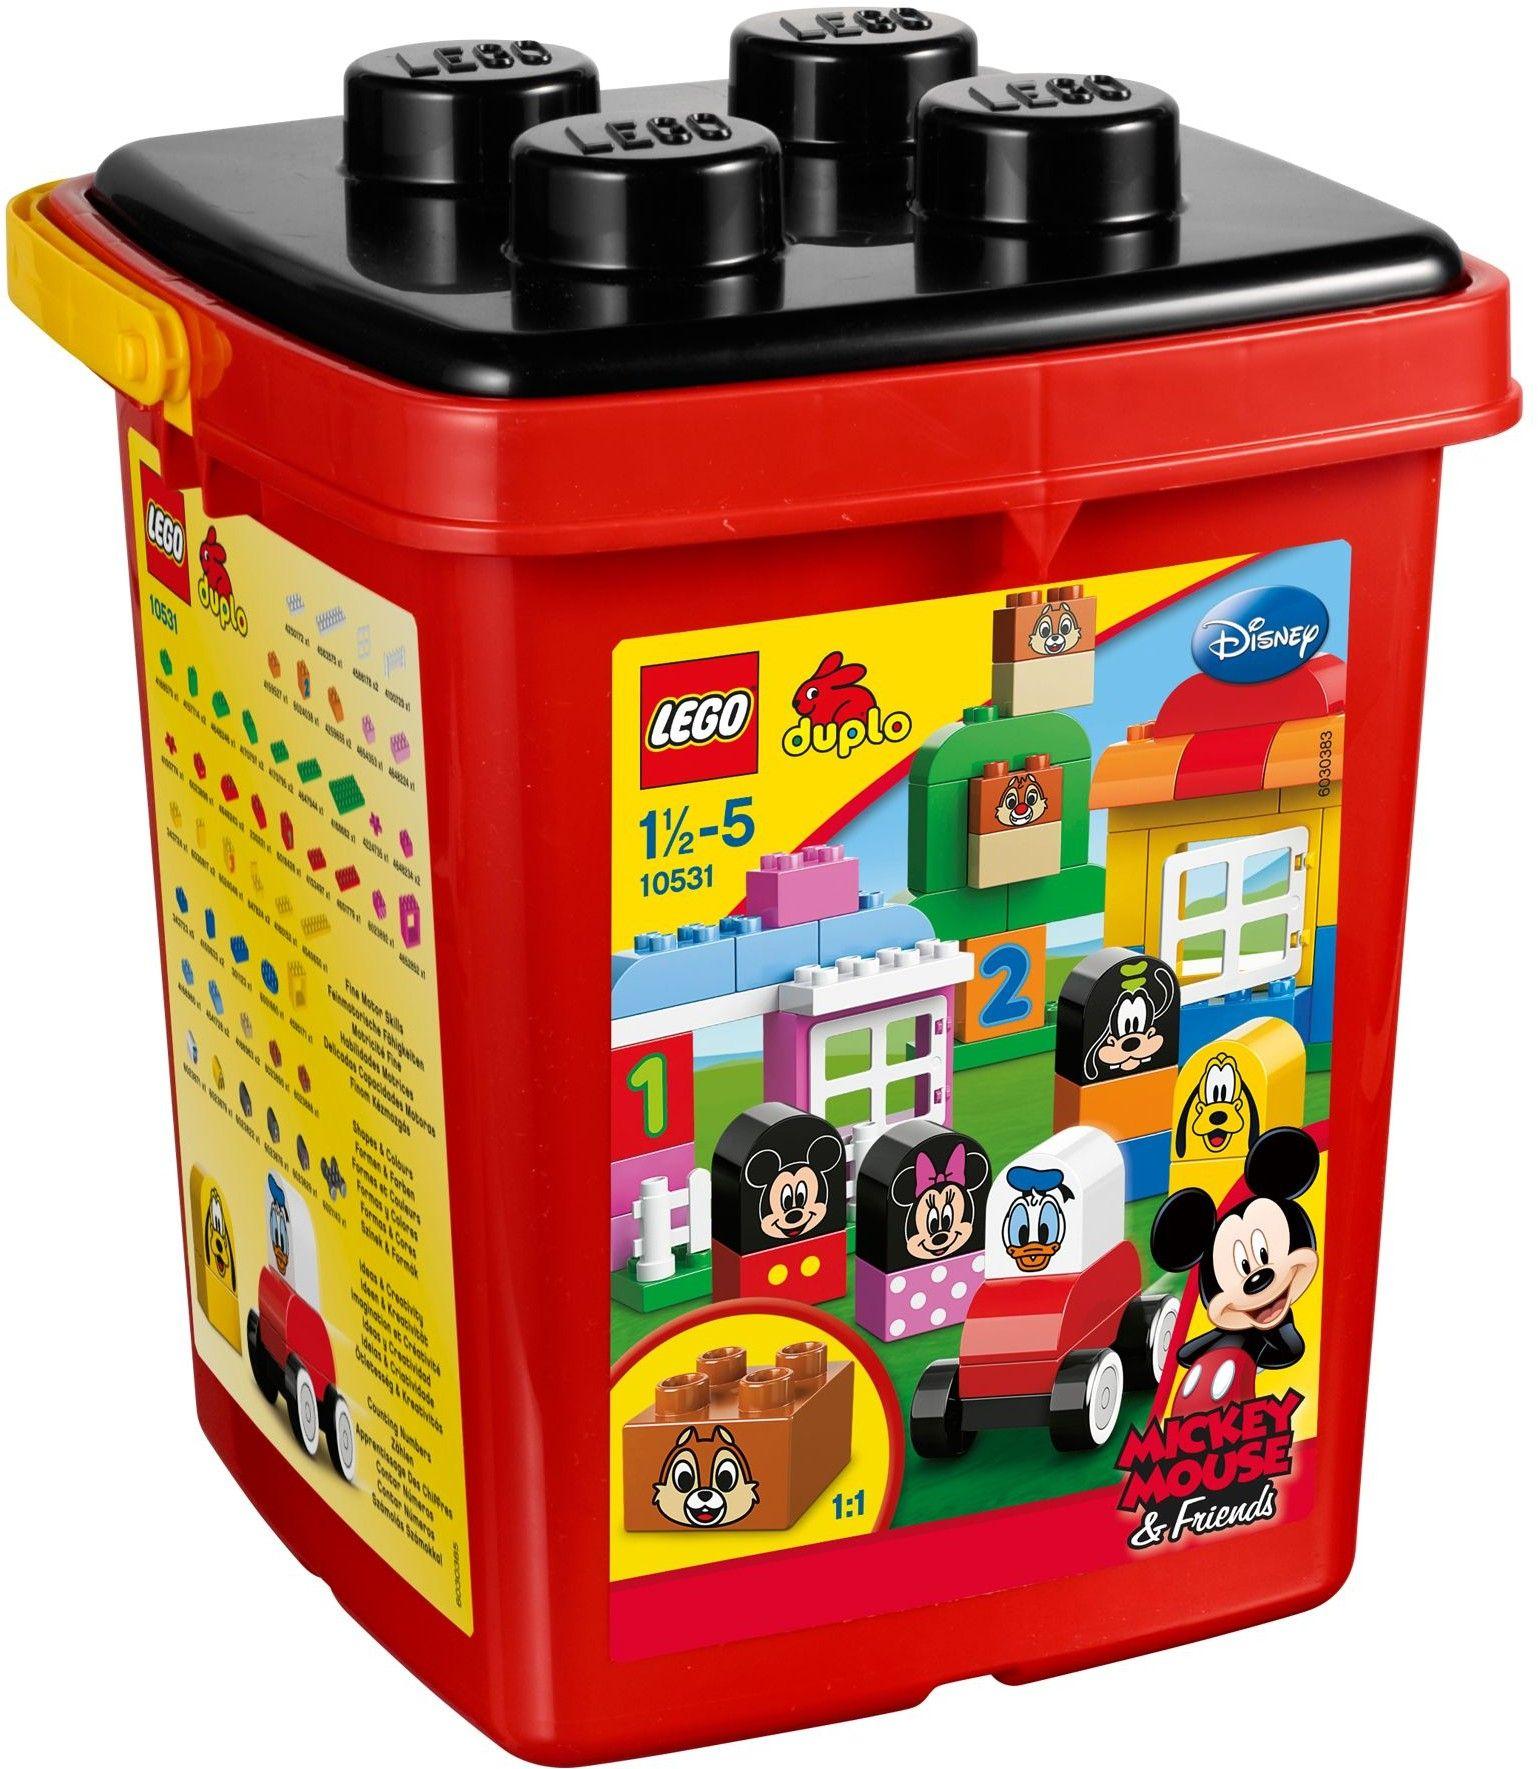 Pin By Namioko On Duplo Lego Duplo Mickey Mouse Toys Duplo